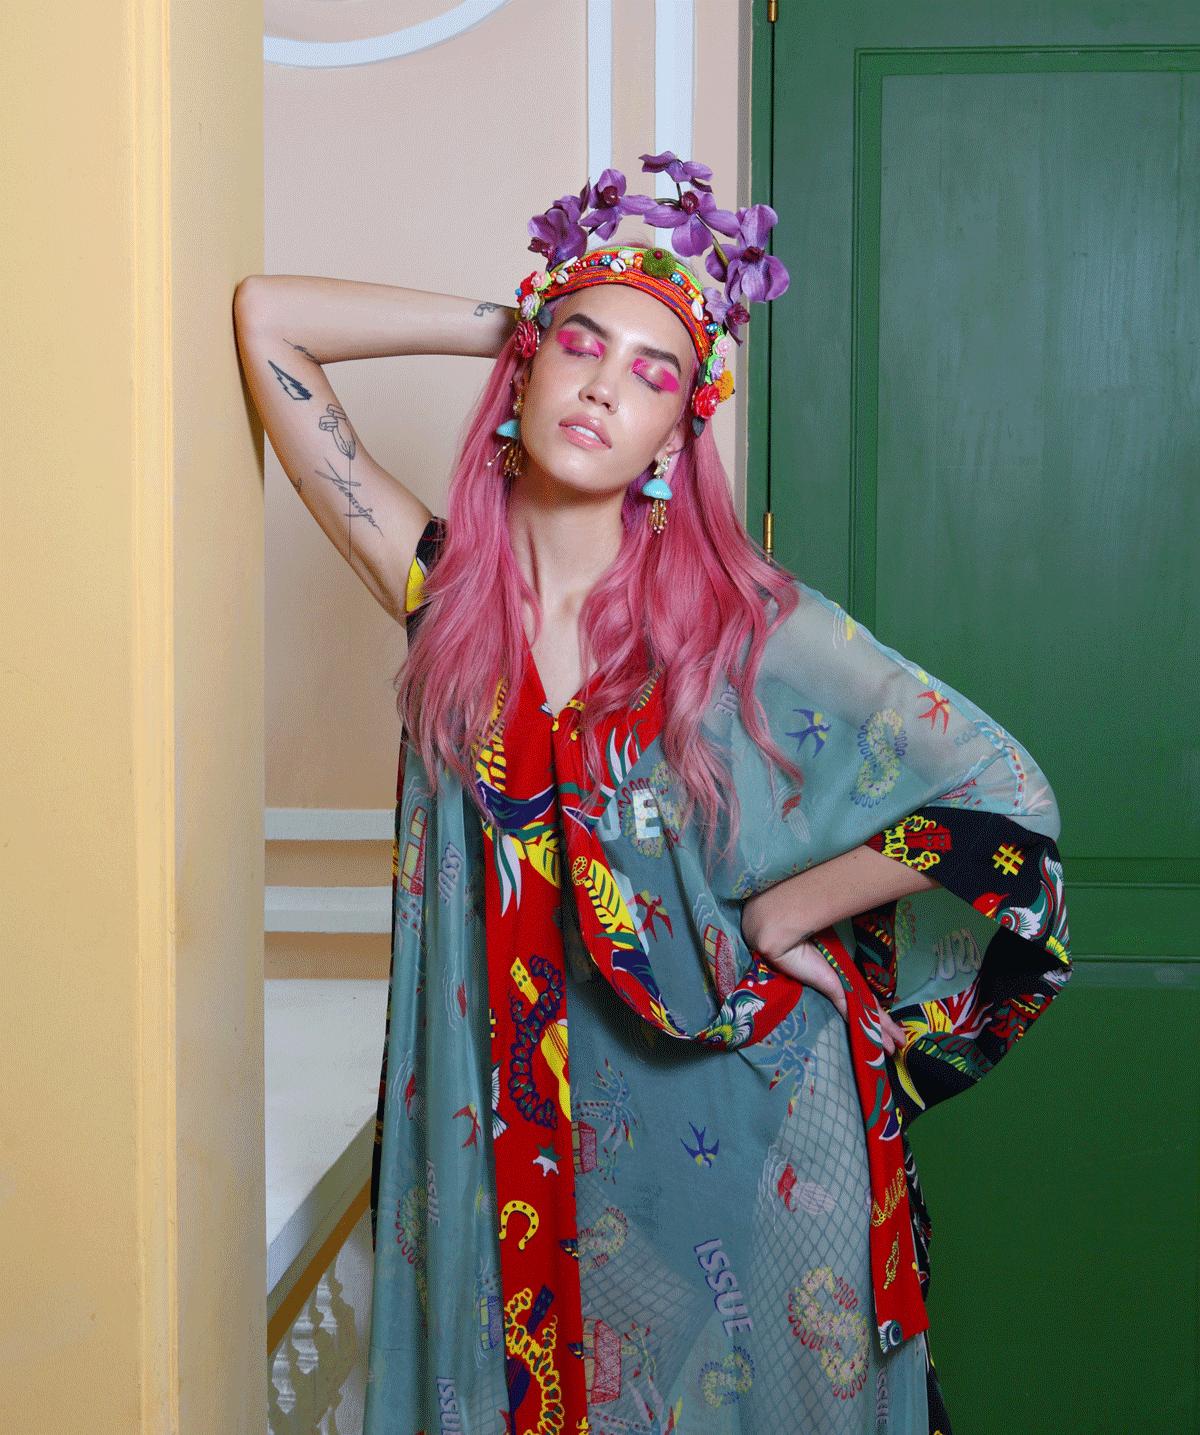 Kassandra Brain @kassybrain in ISSUE / accessories by 77th